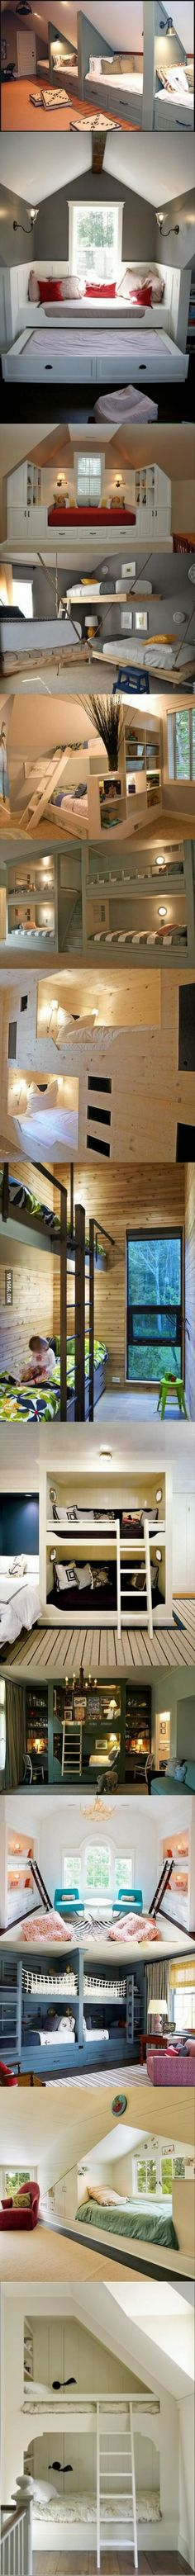 cute bedroom ideas. :)